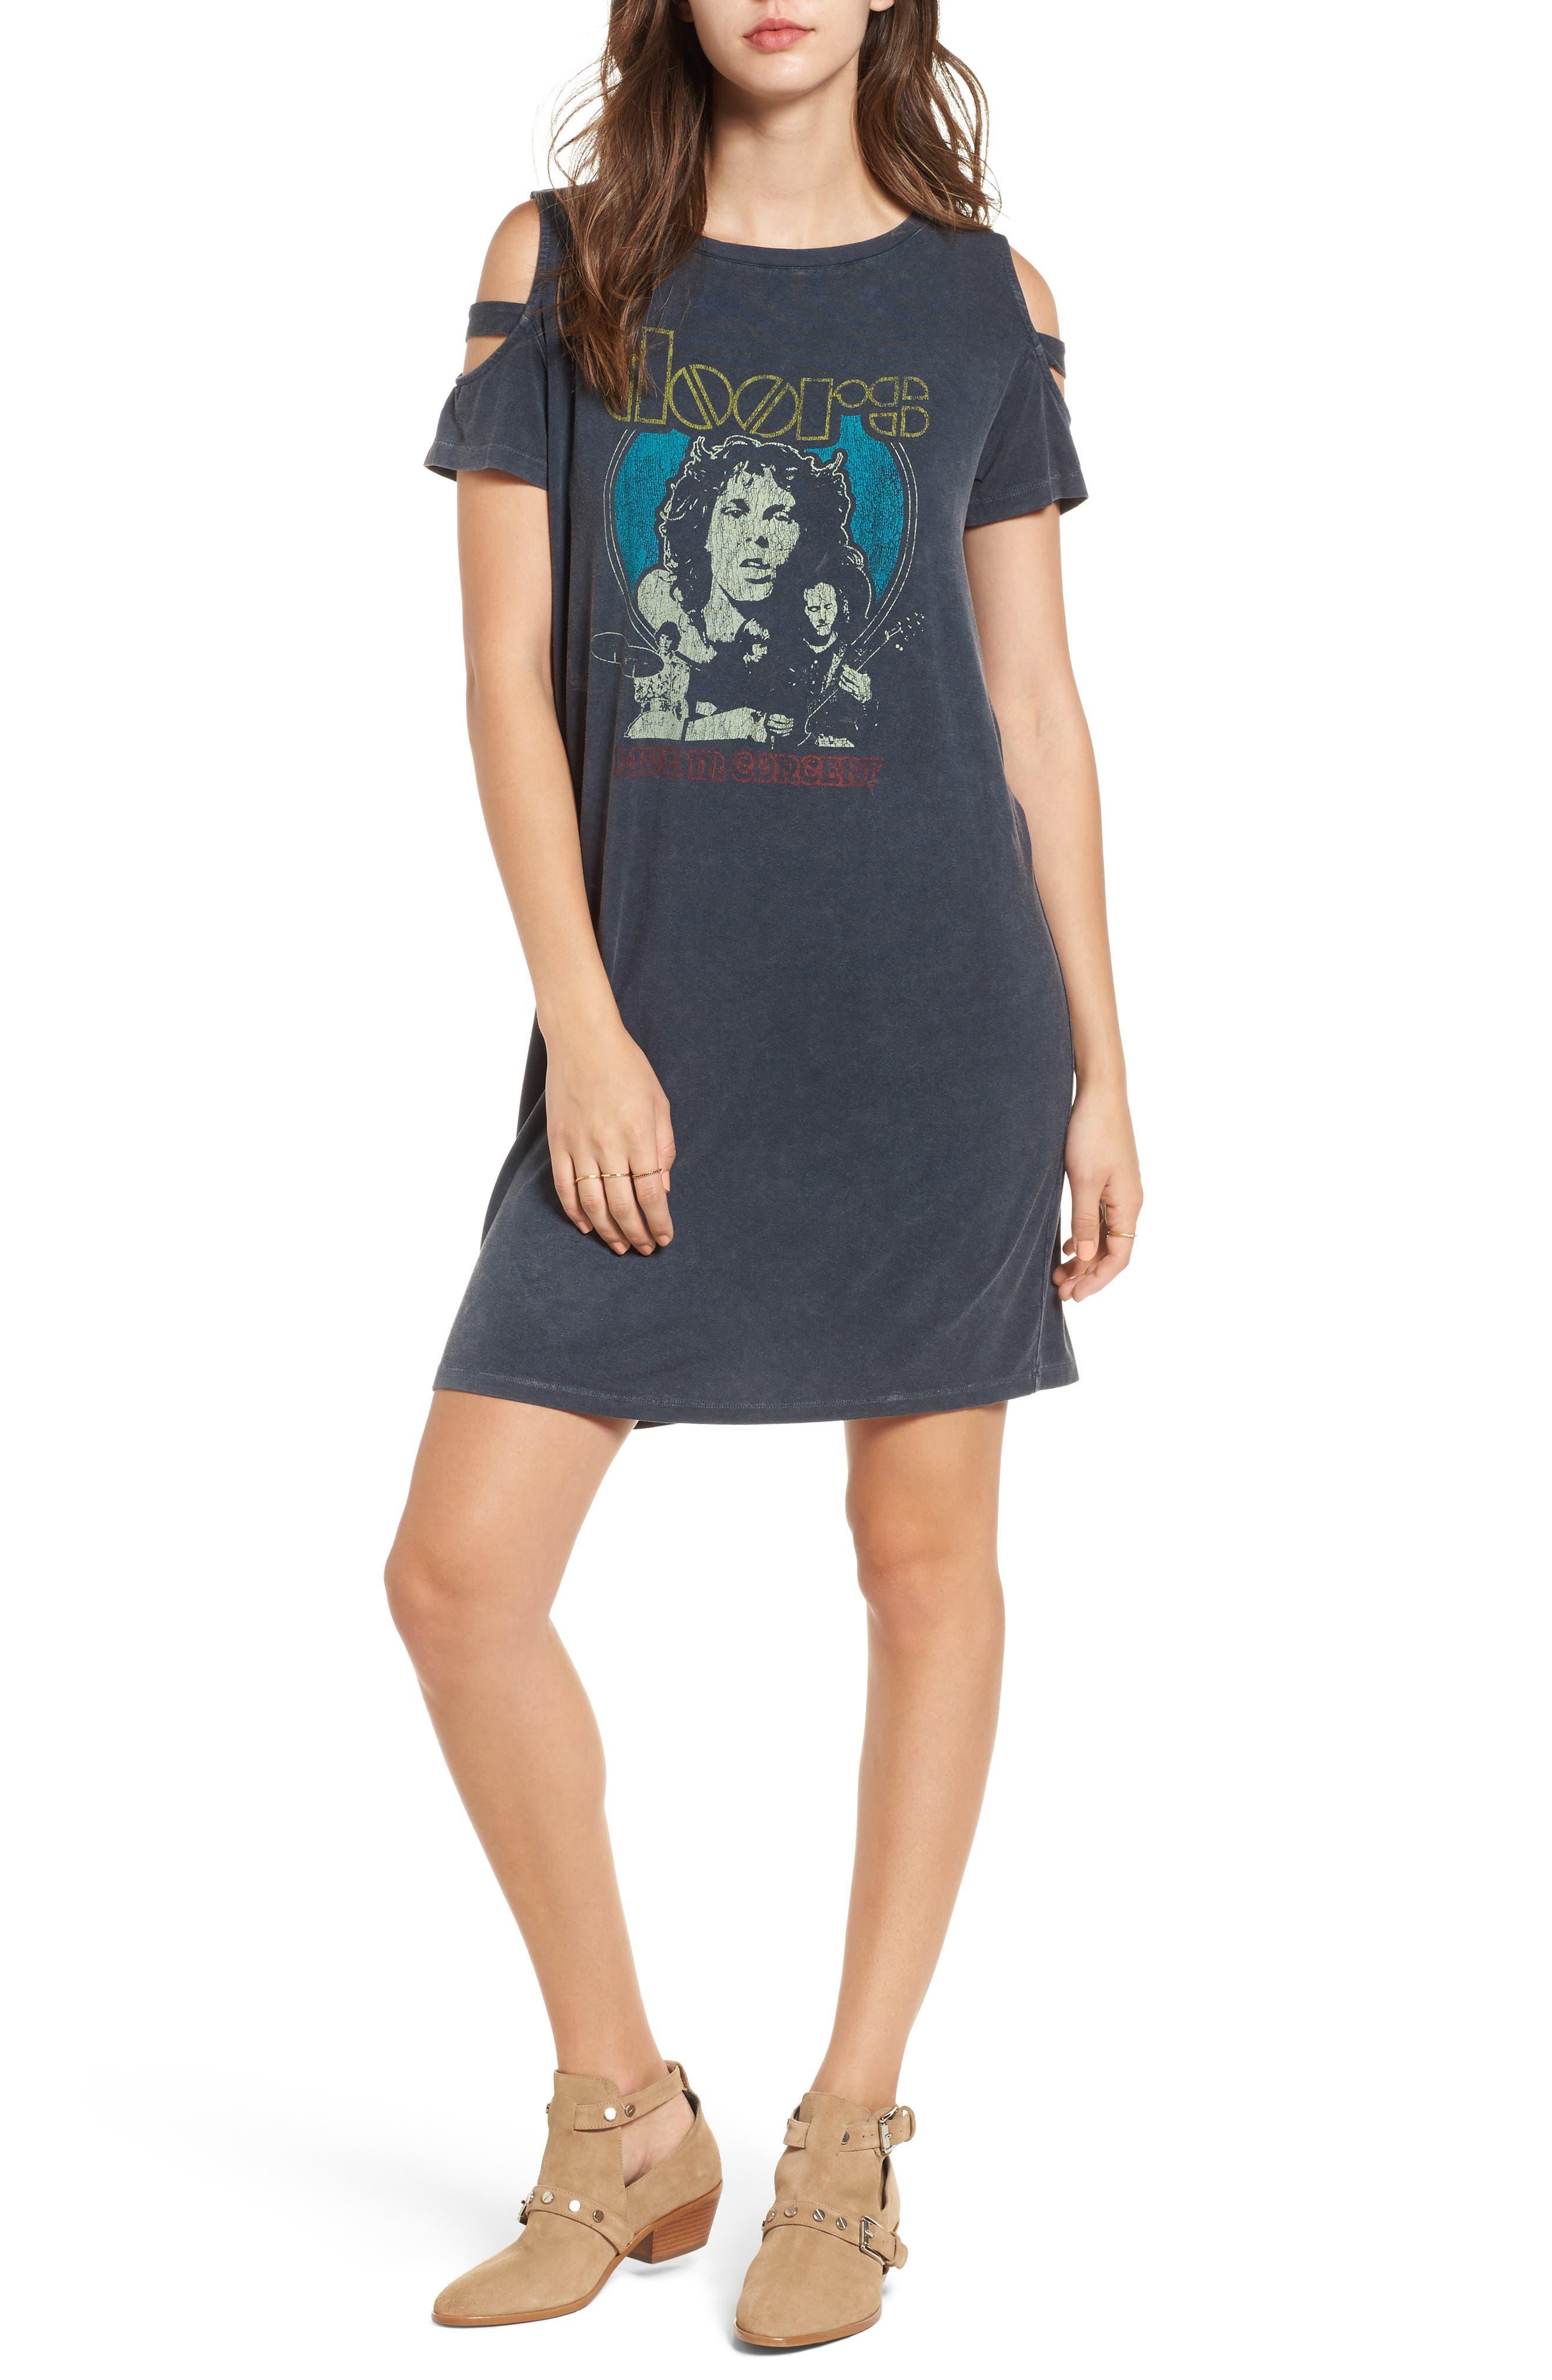 Doors Distressed Band T-Shirt Dress,                         Main,                         color, Charcoal